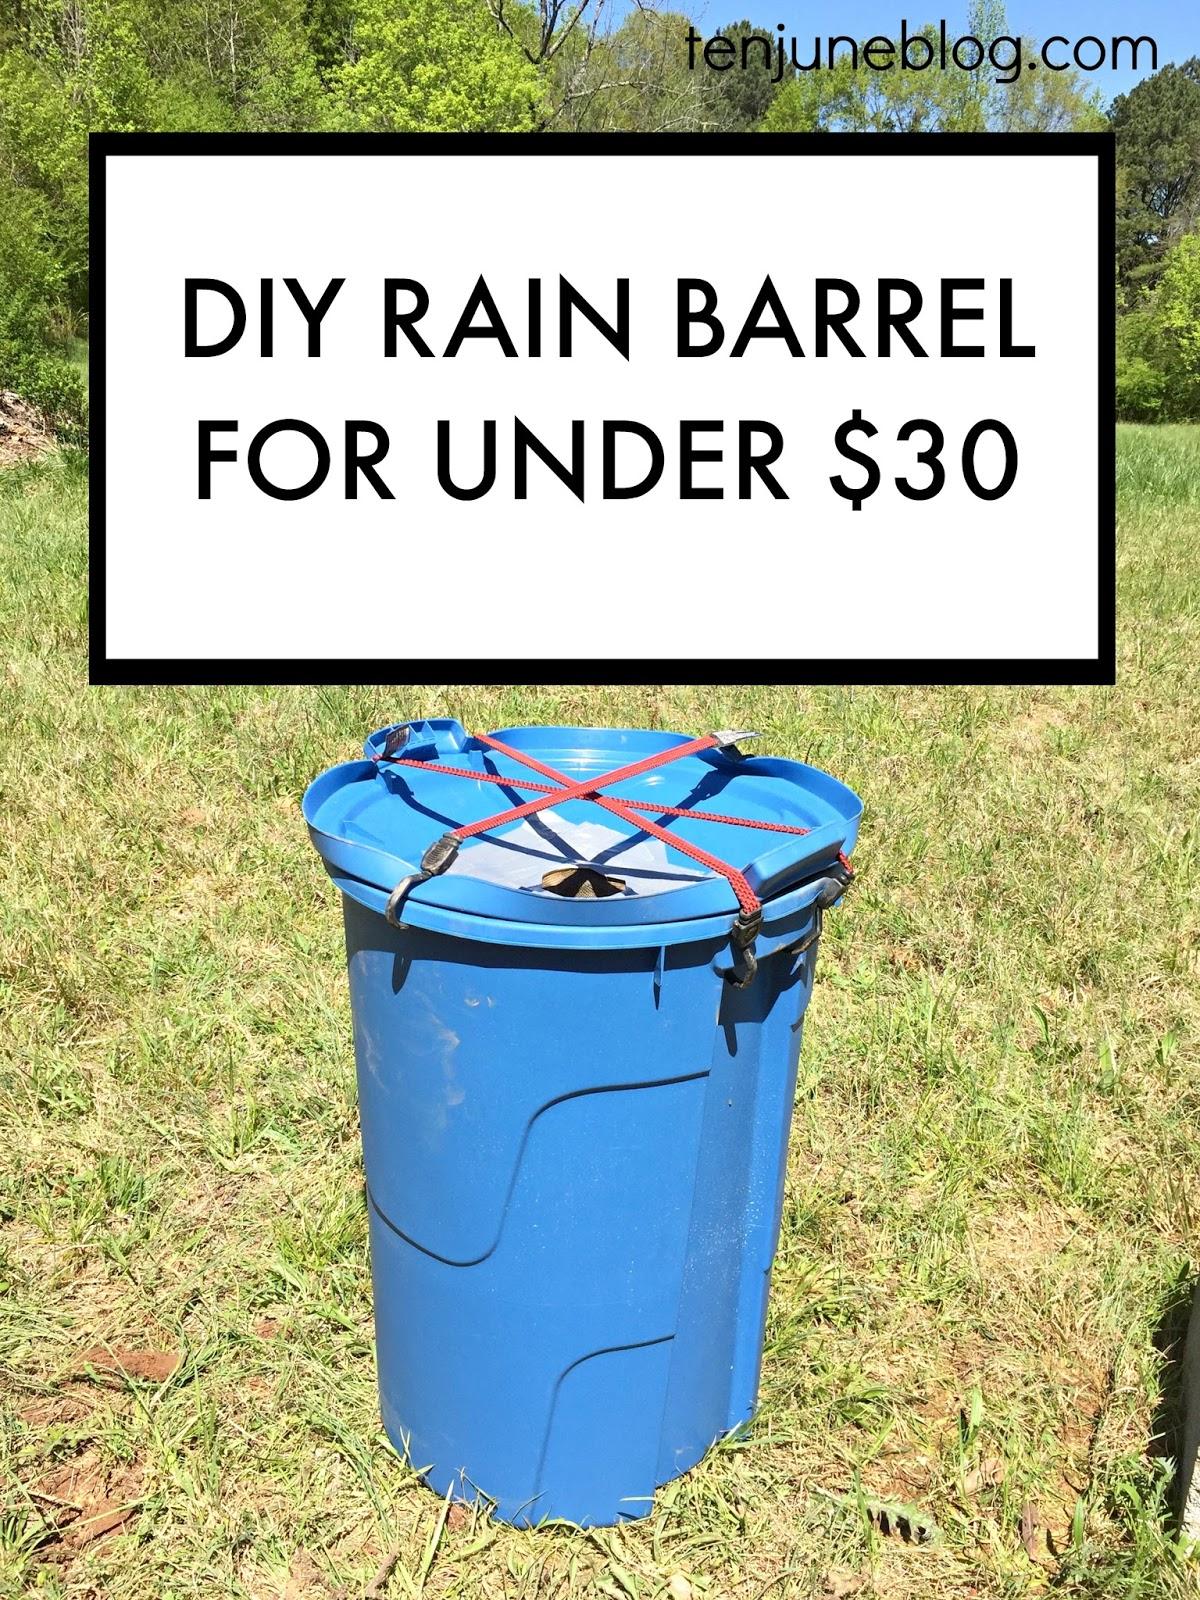 Ten june diy rain barrel for under 30 for Diy small rain barrel